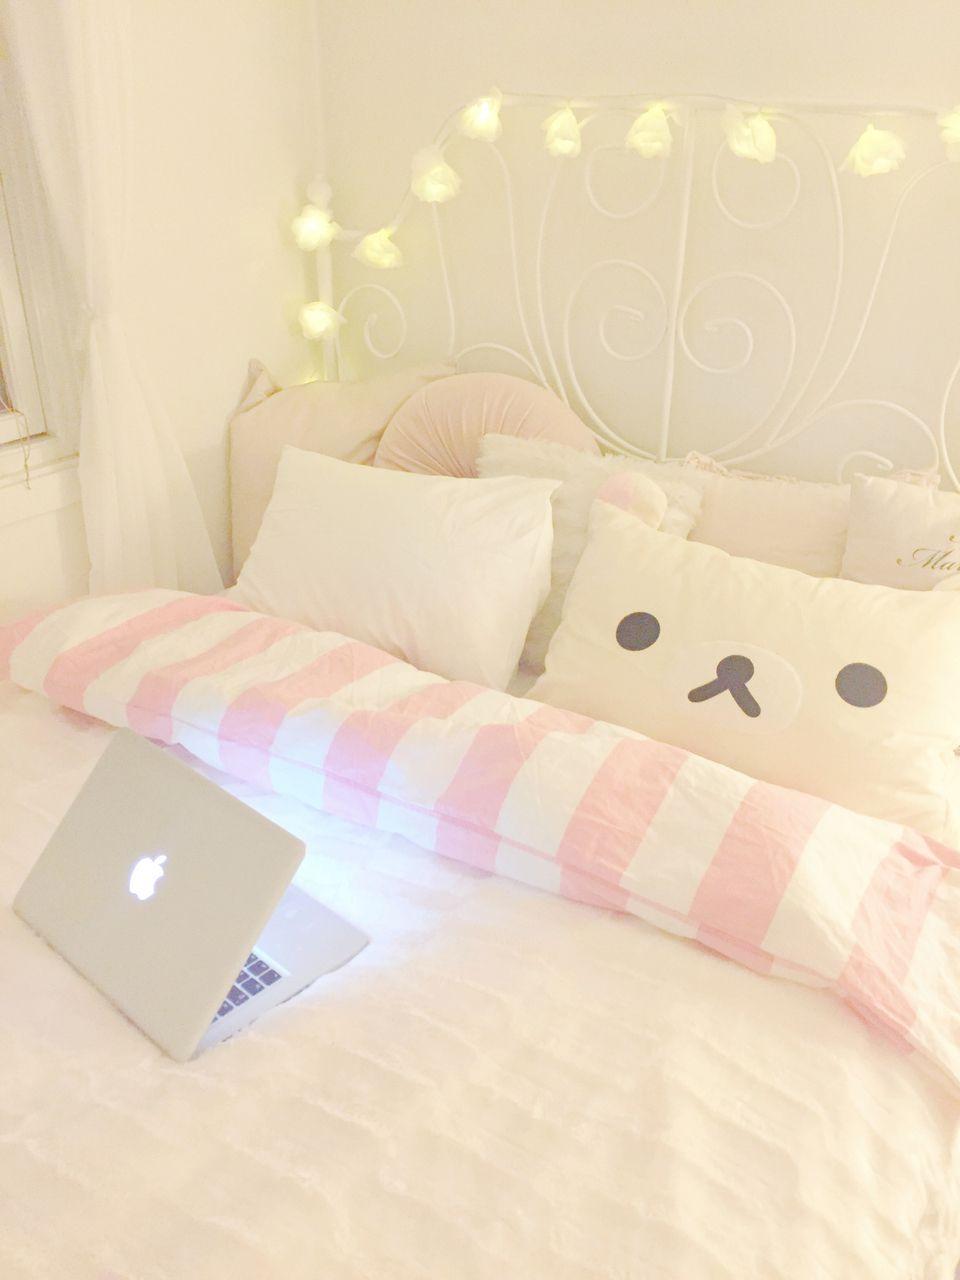 kawaii shop kawaii craft decoden pinterest schlafzimmer jugendzimmer und ideen. Black Bedroom Furniture Sets. Home Design Ideas